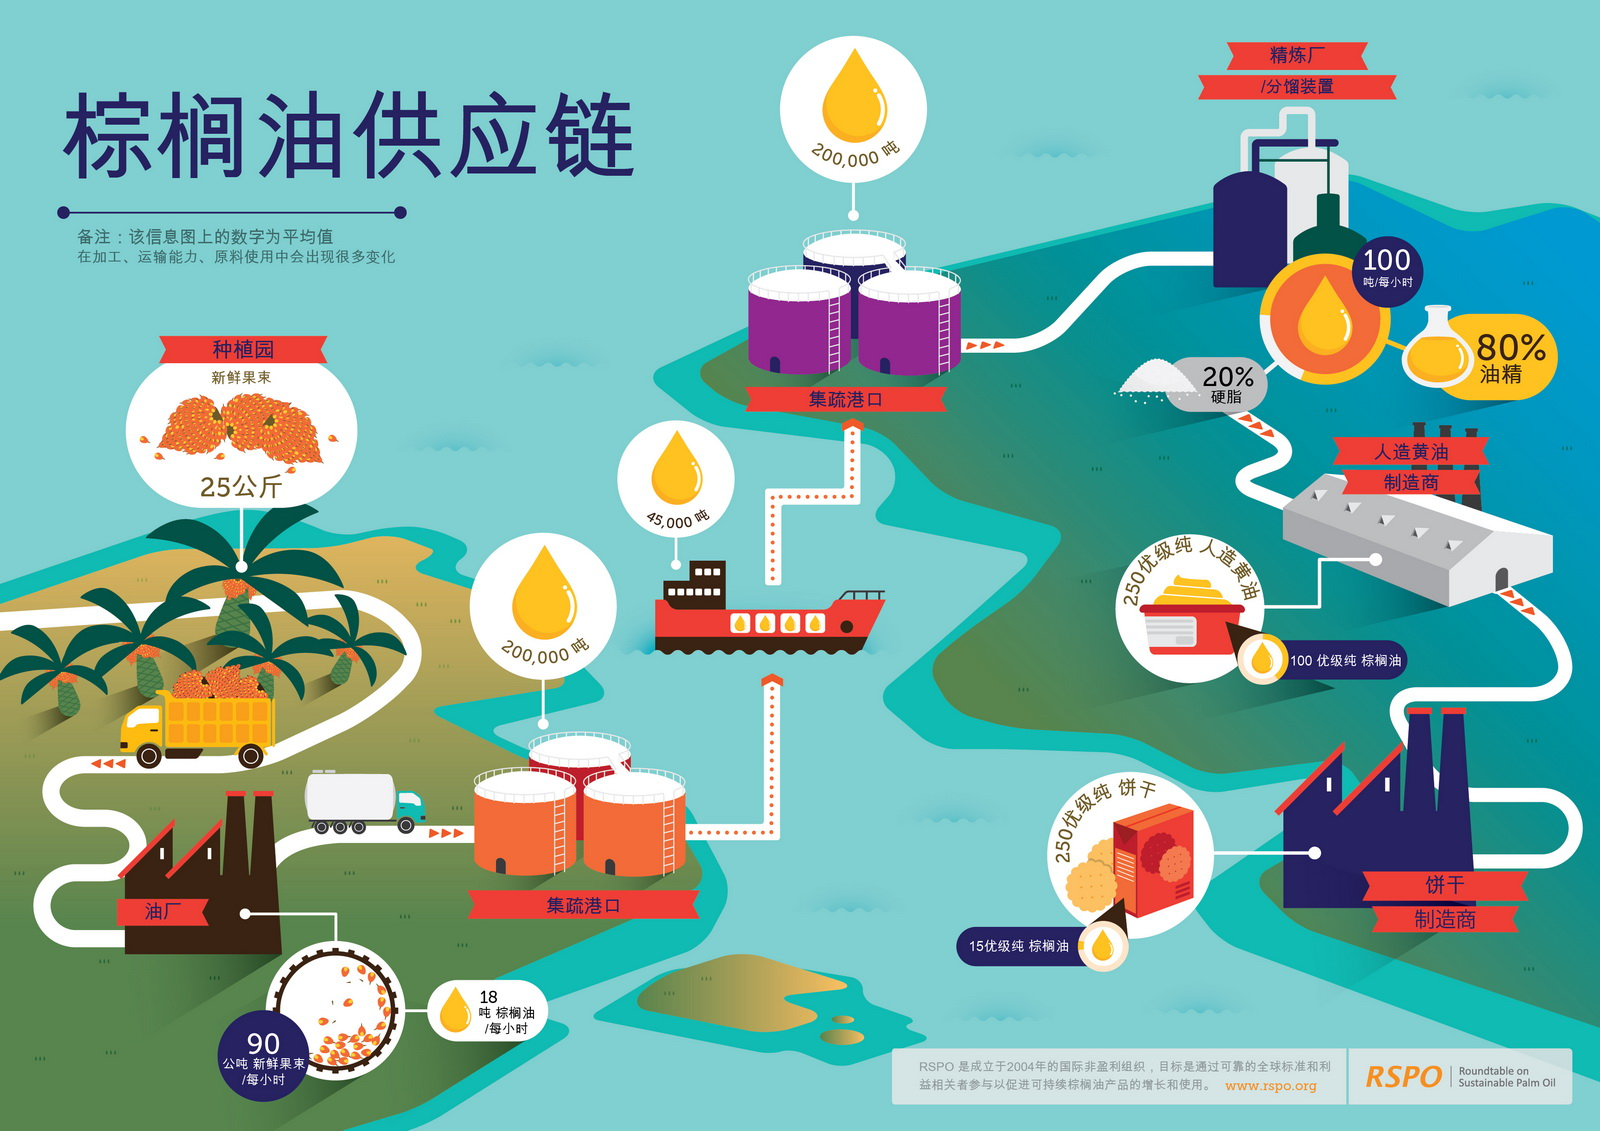 RSPO palm oil illustration